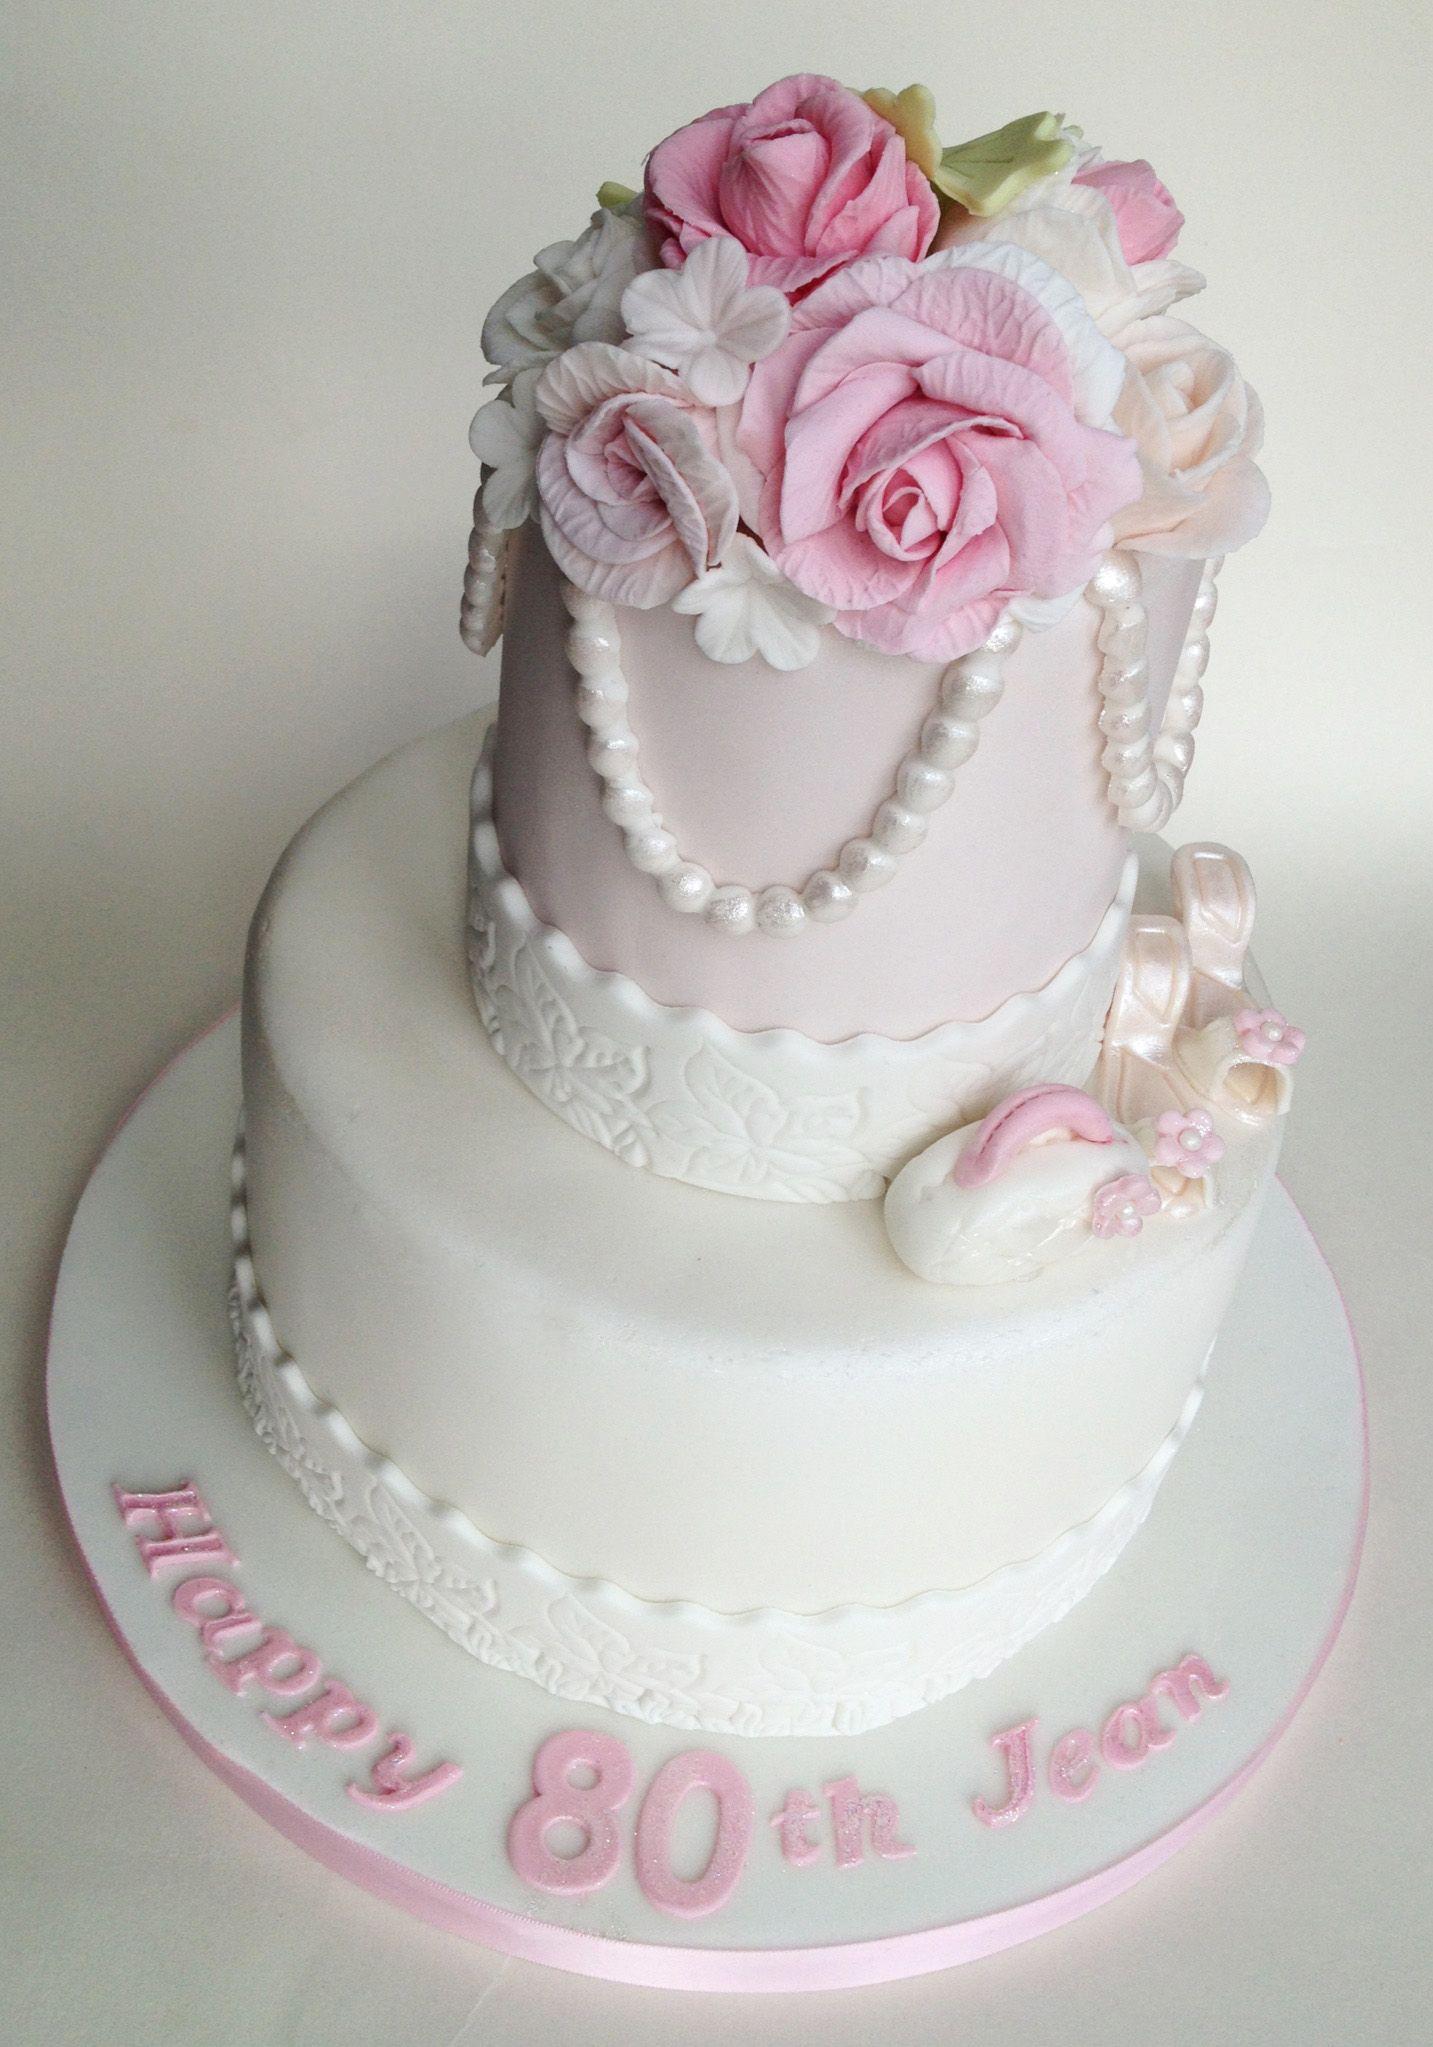 80th Birthday Cake 2 Tier